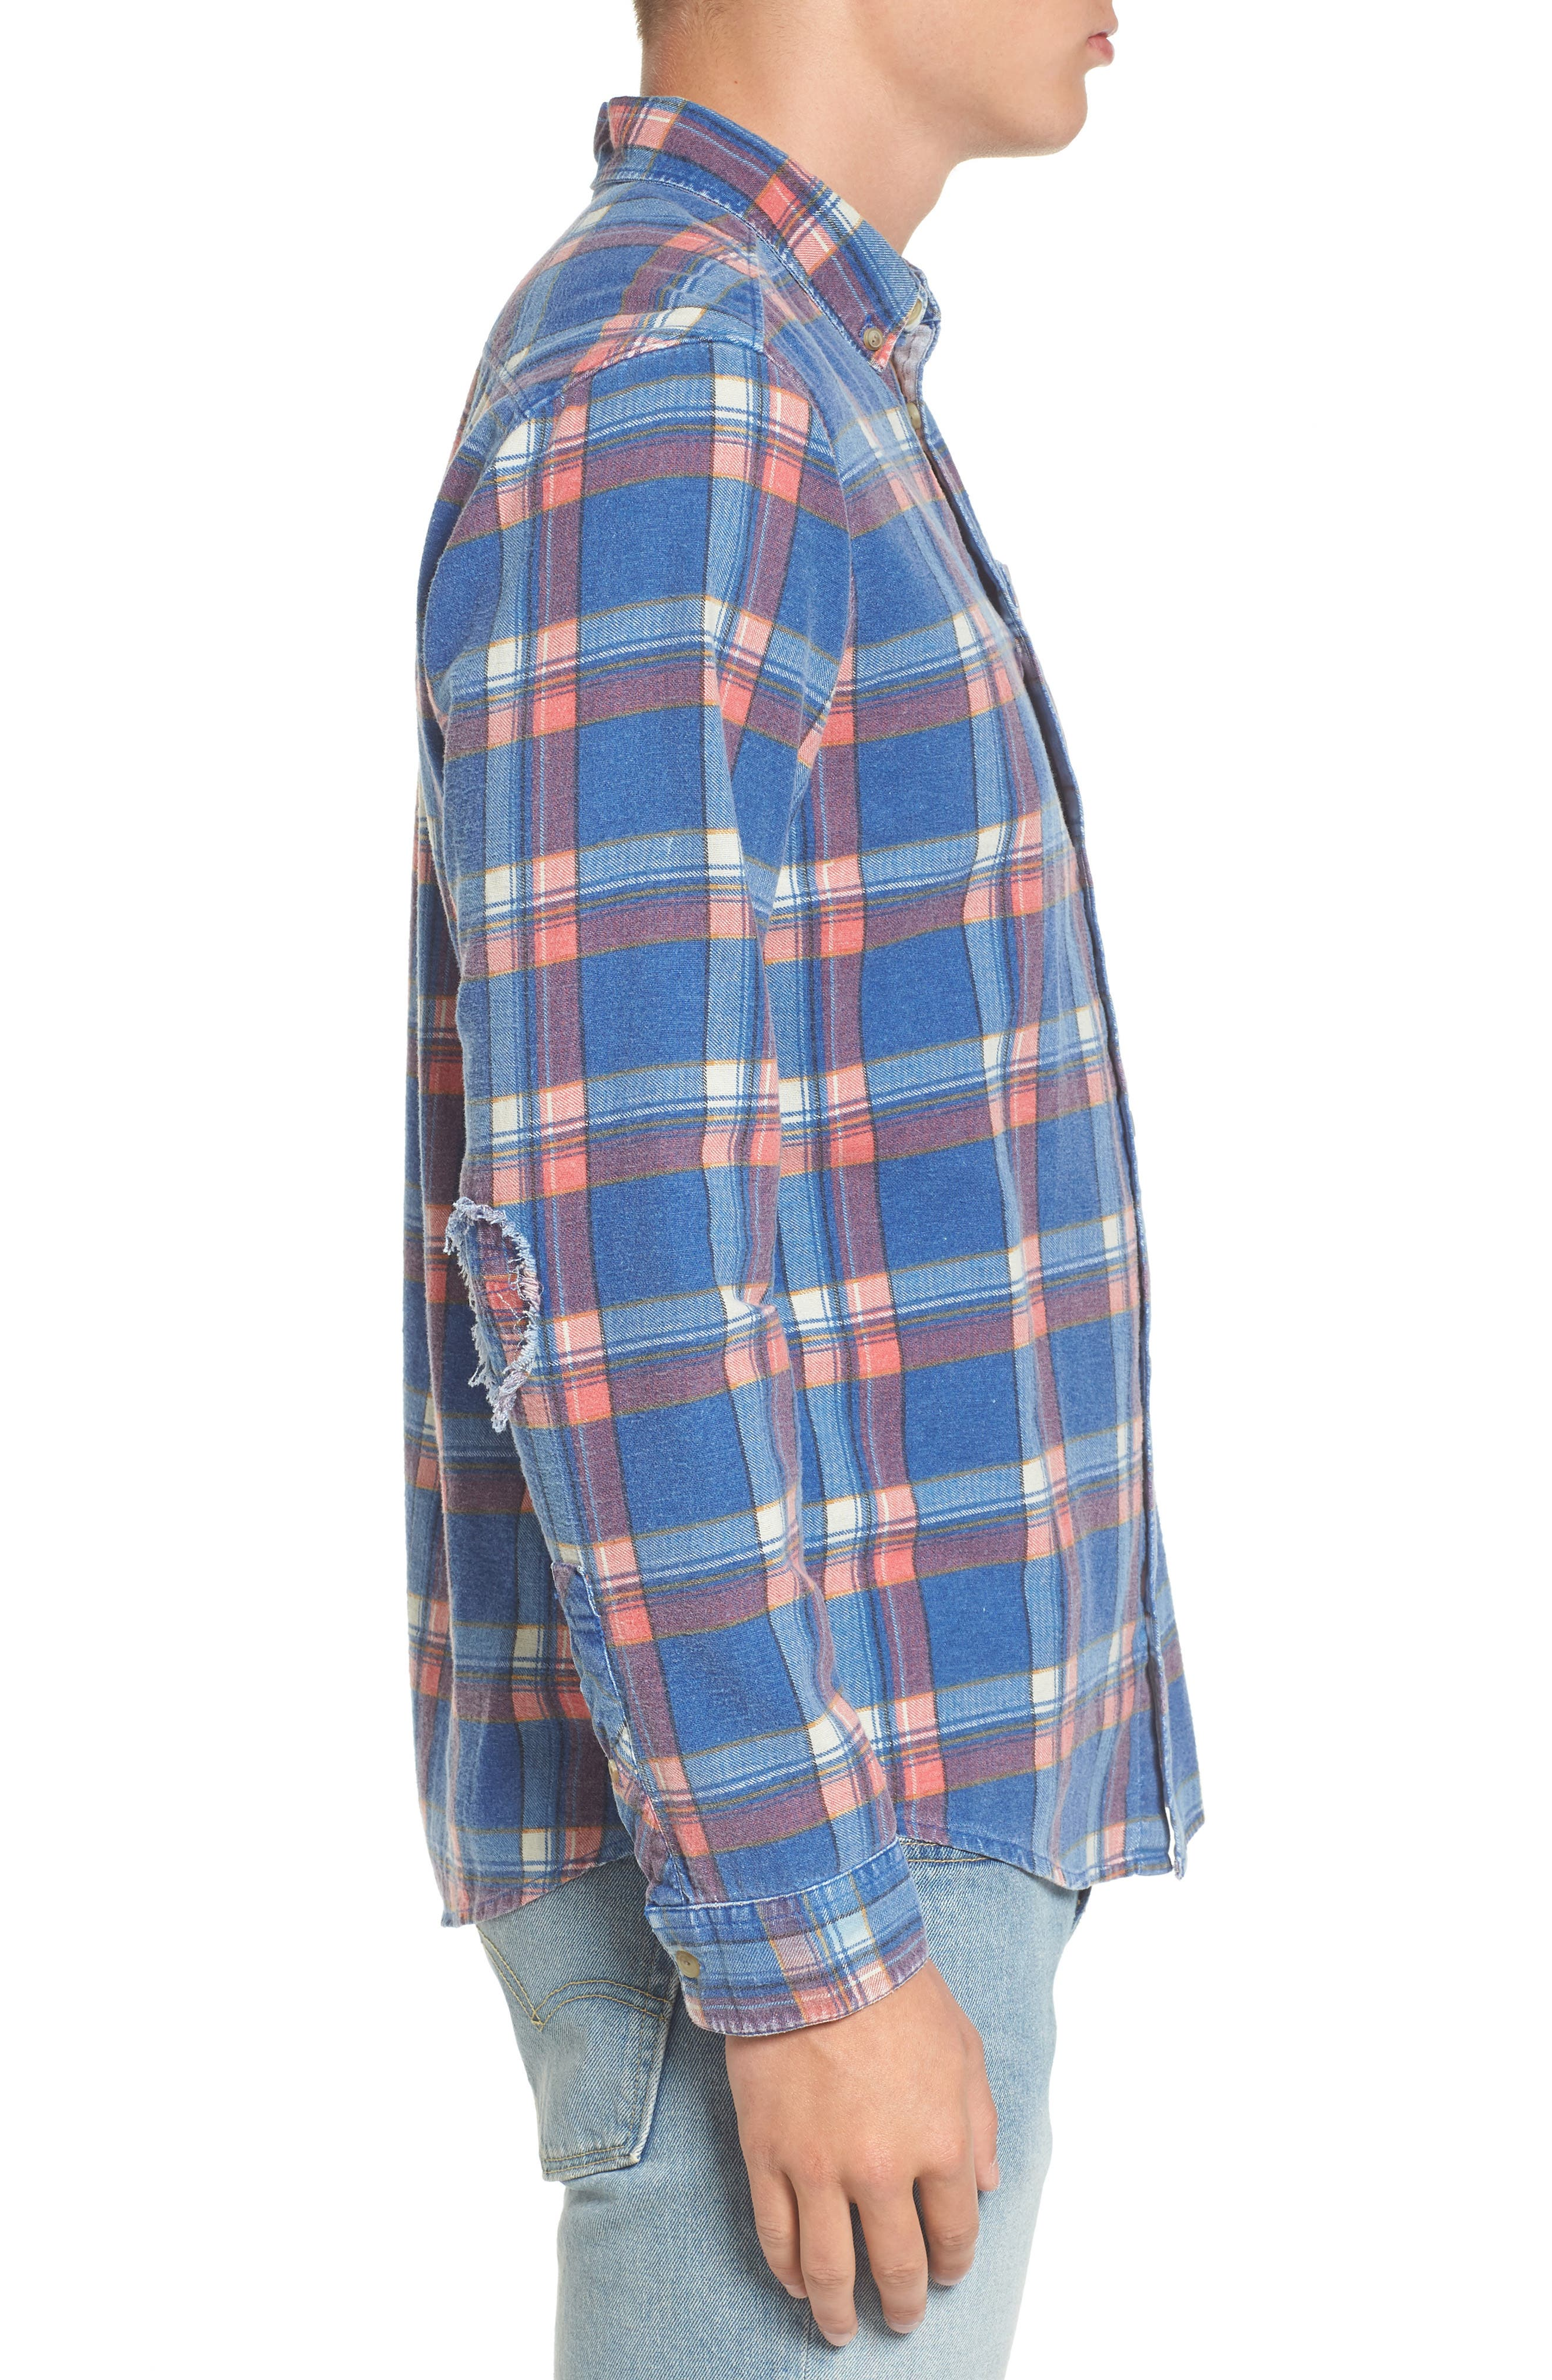 x Kevin Long Plaid Shirt,                             Alternate thumbnail 3, color,                             462